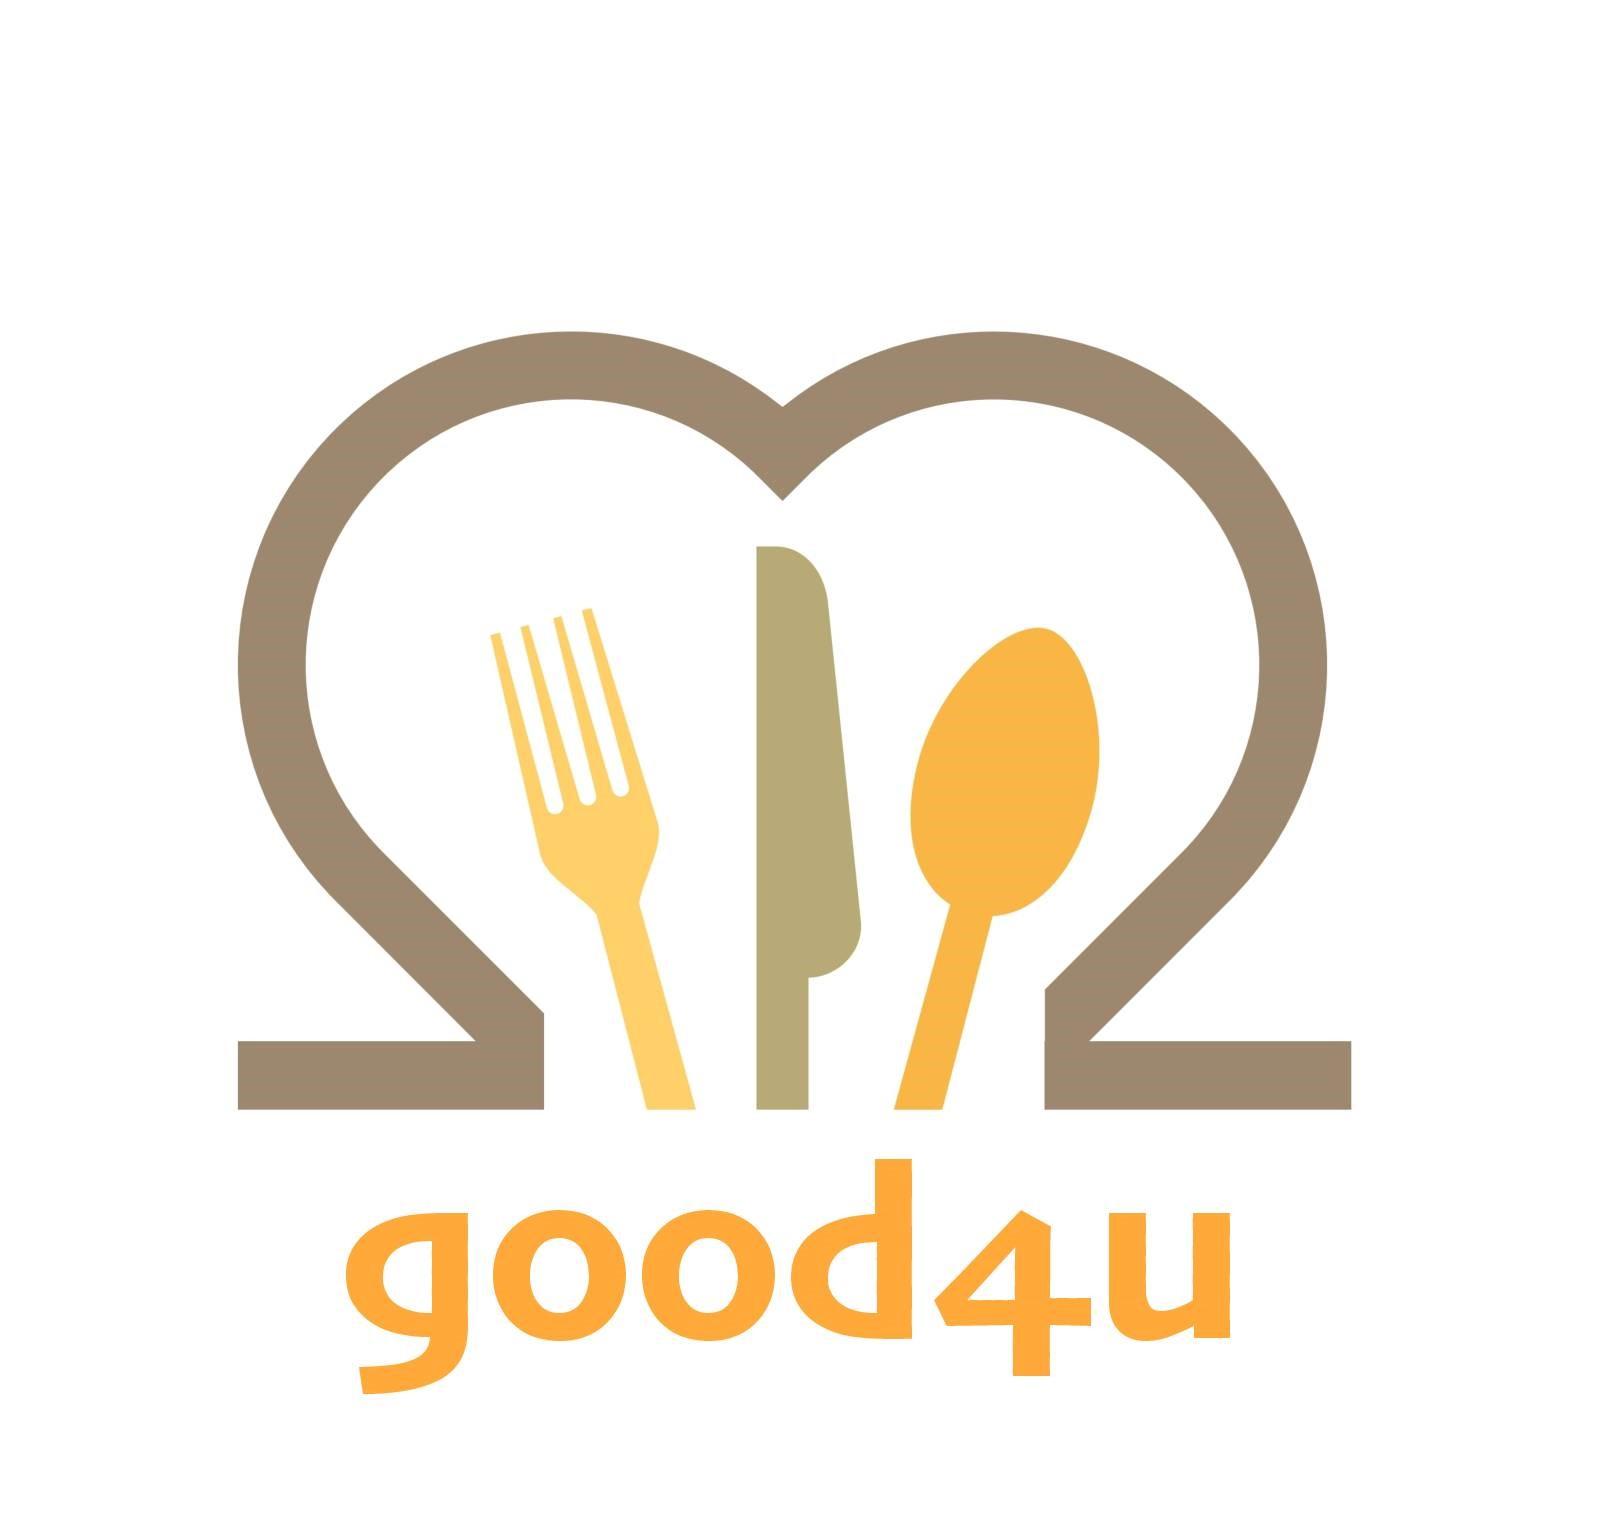 good4u logo.jpg